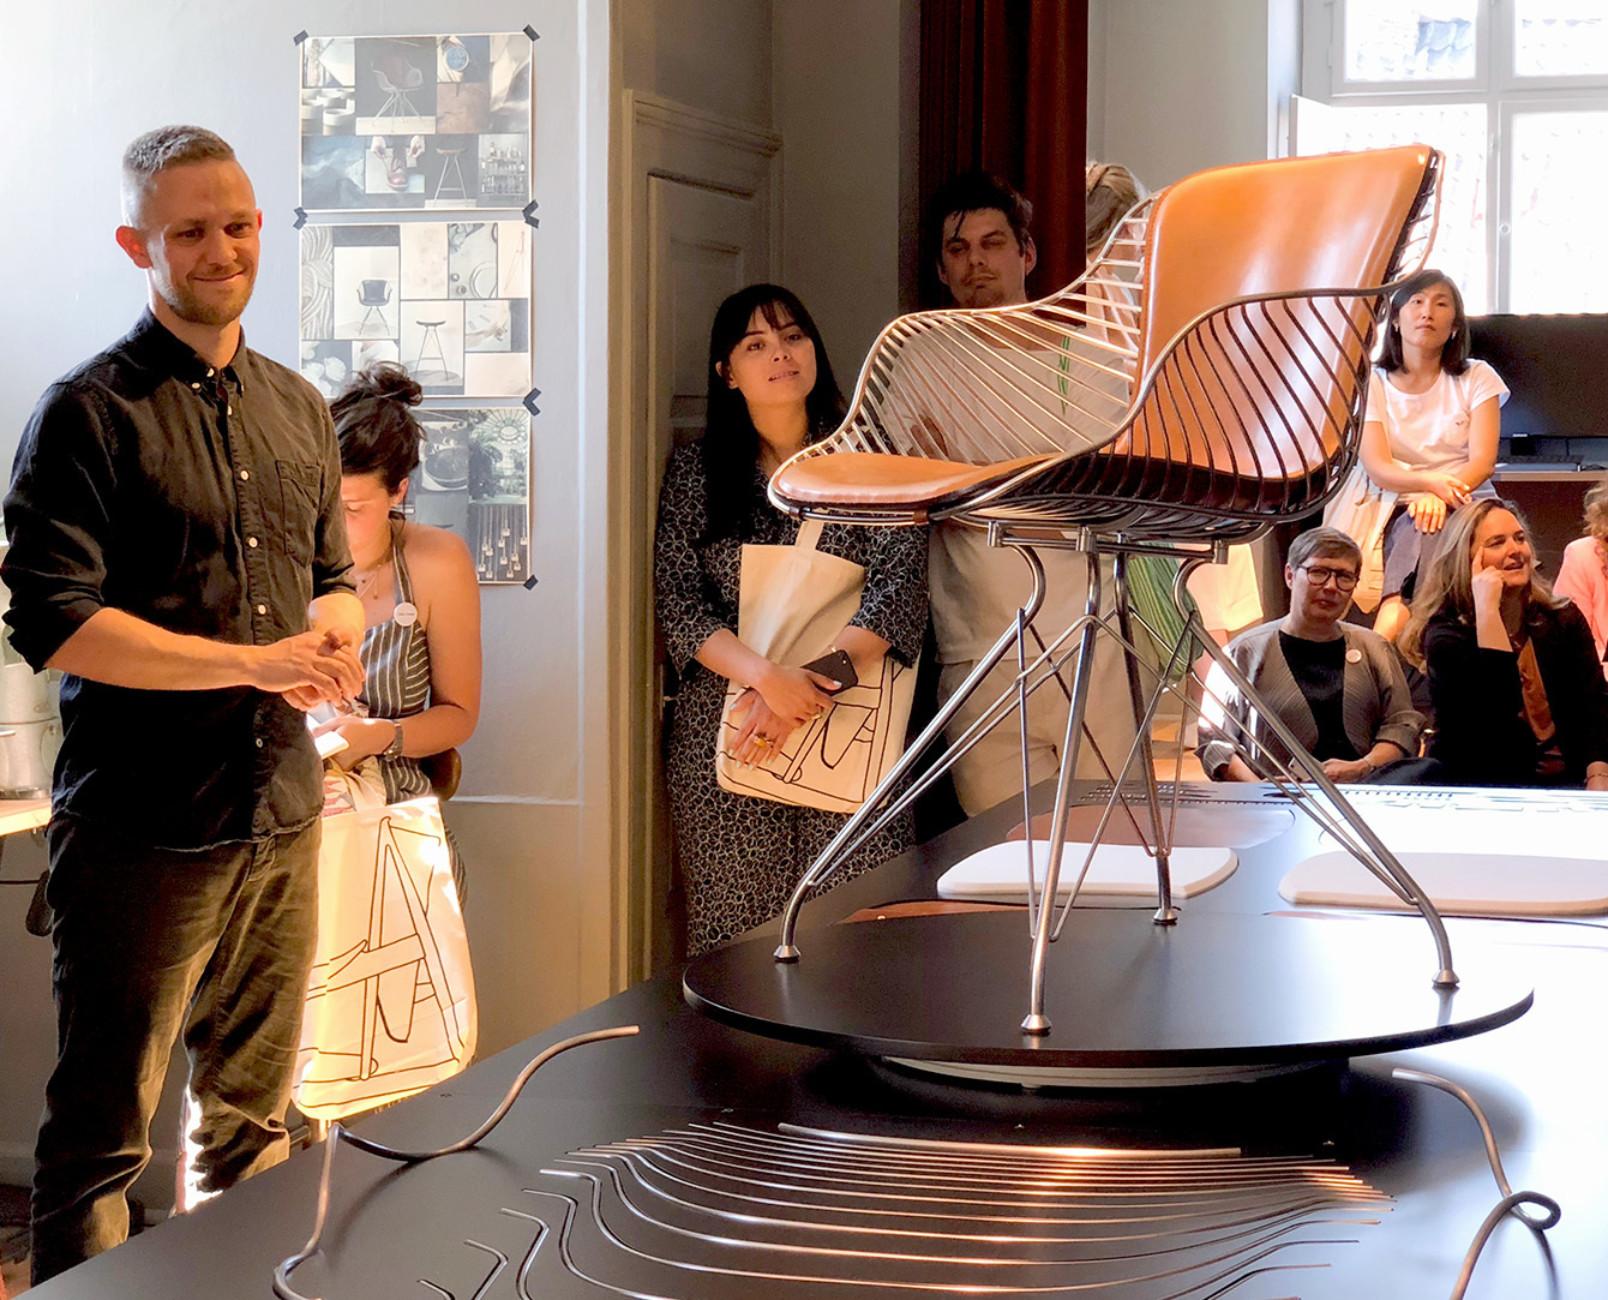 Christian Dyrman leads through the studio of Overgaard&Dyrman